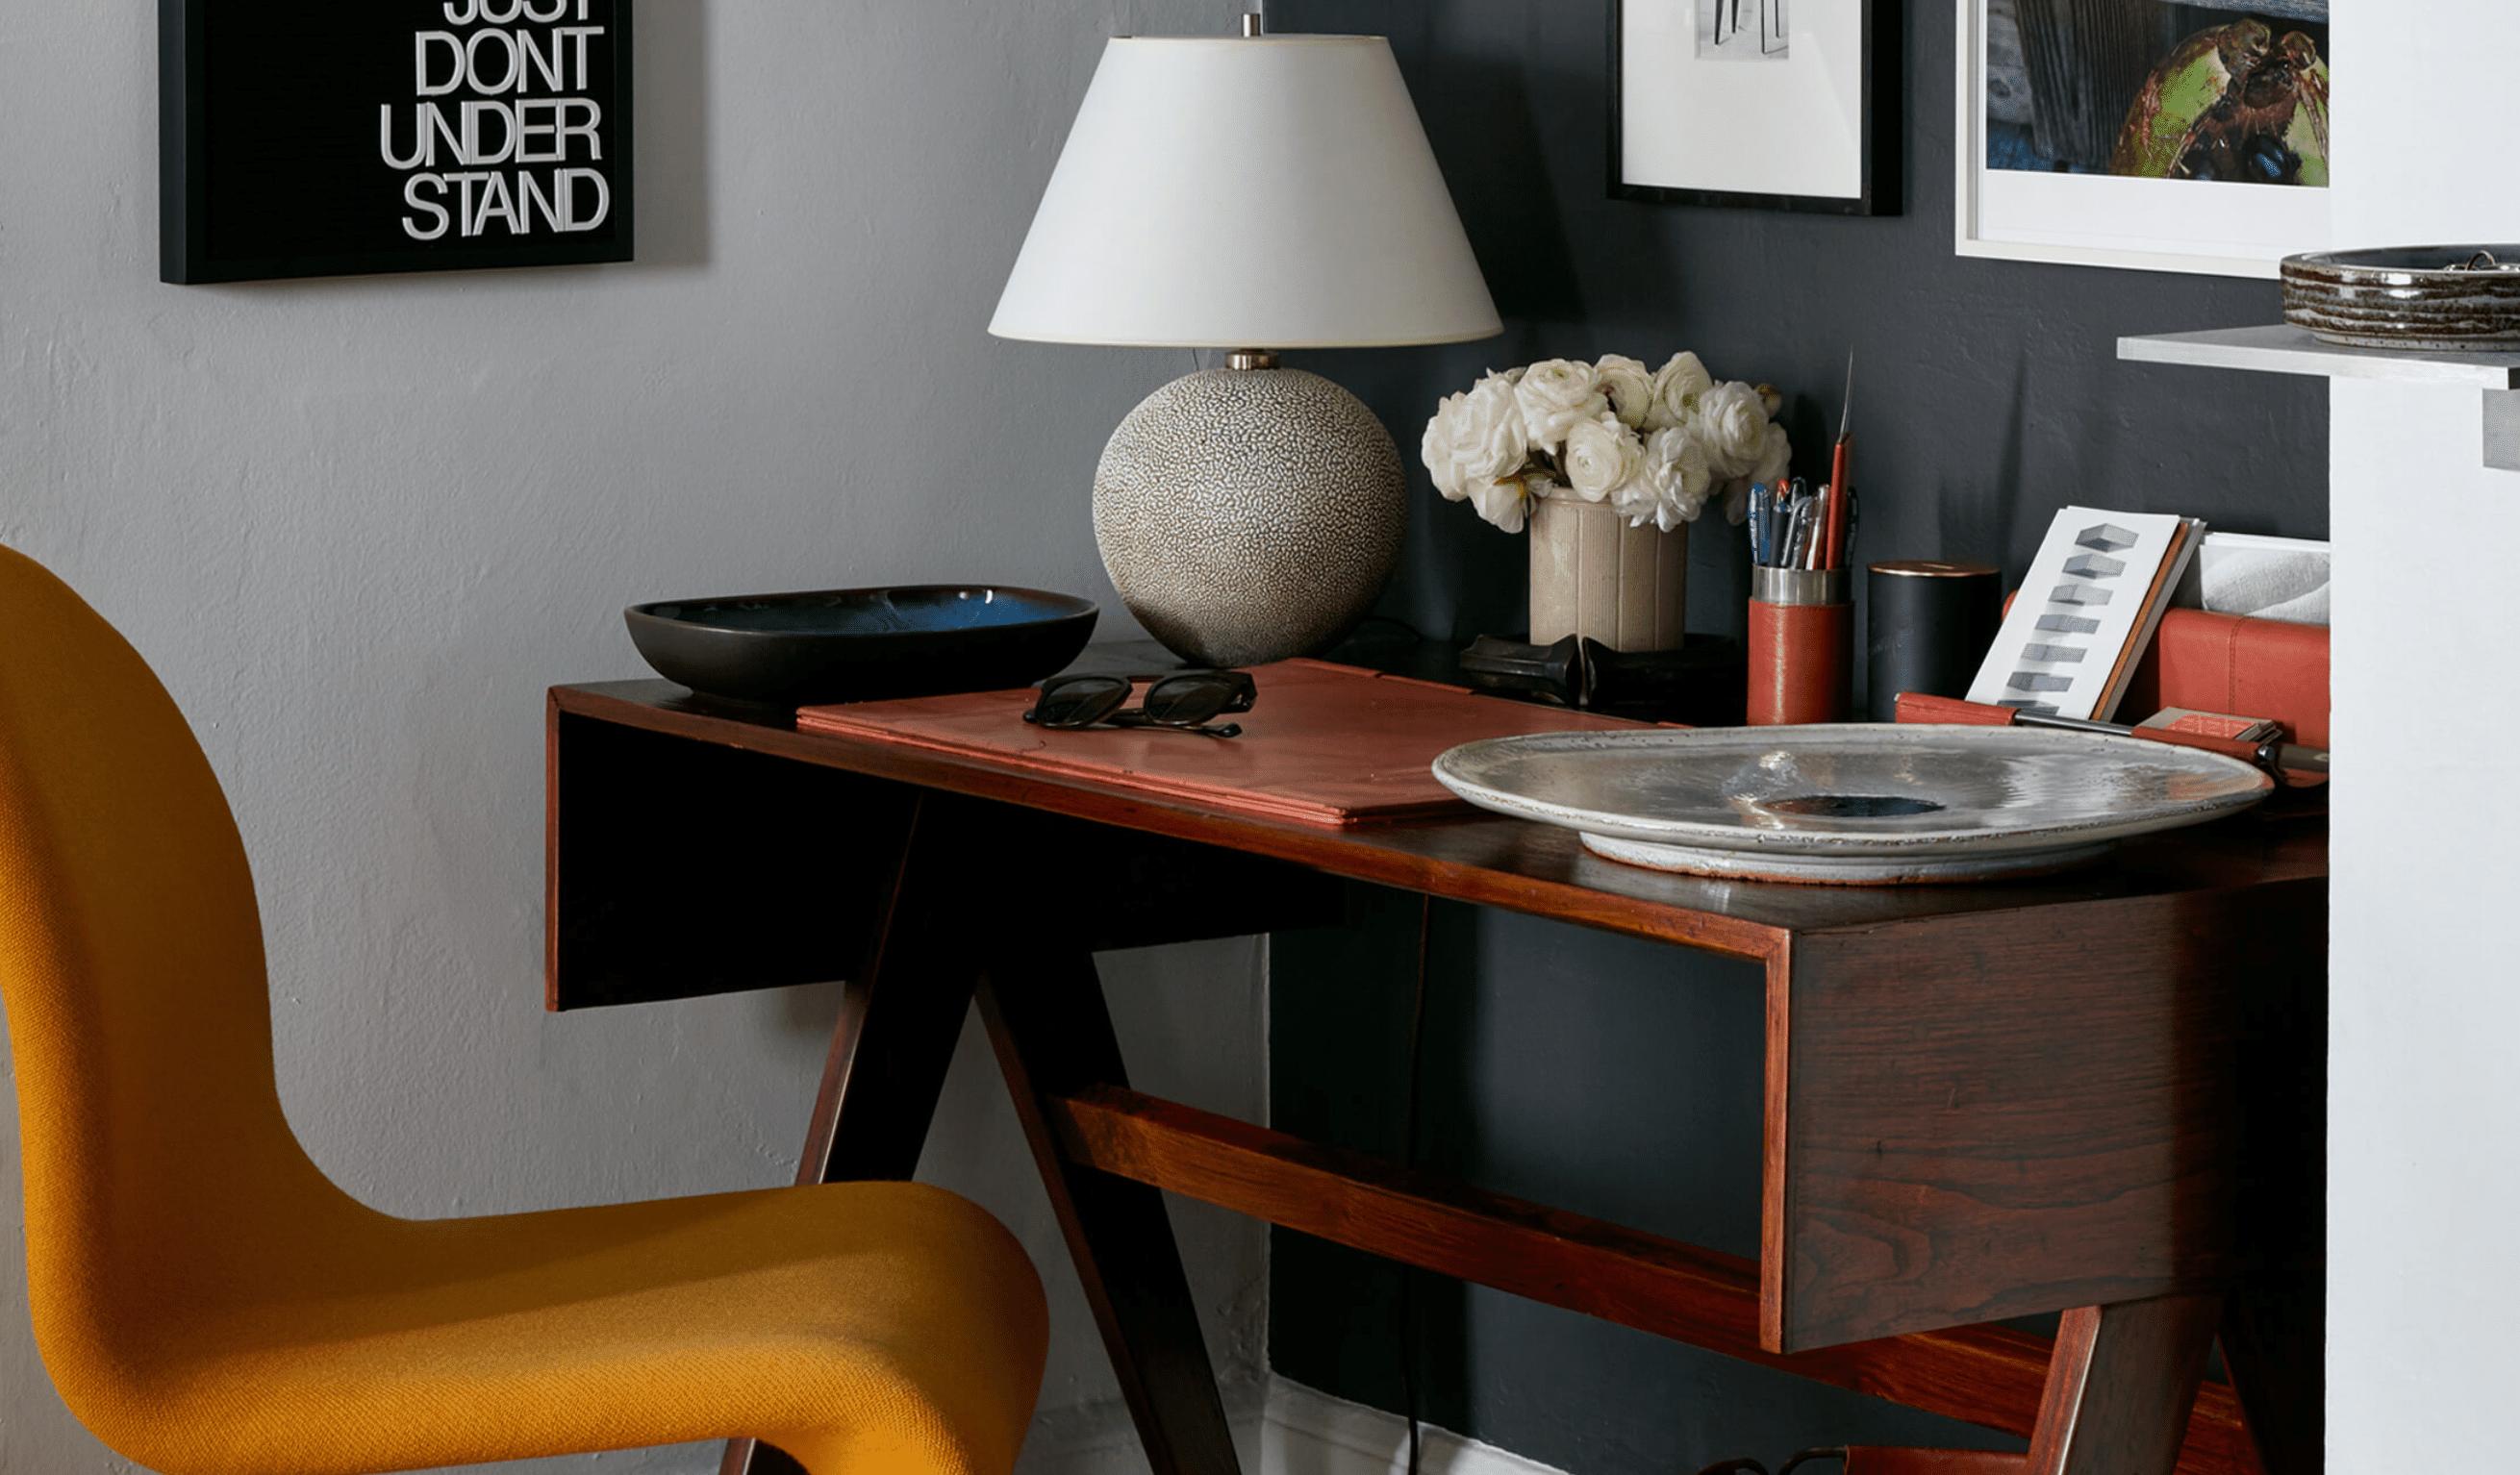 An antique midcentury modern desk placed alongside a contemporary desk chair